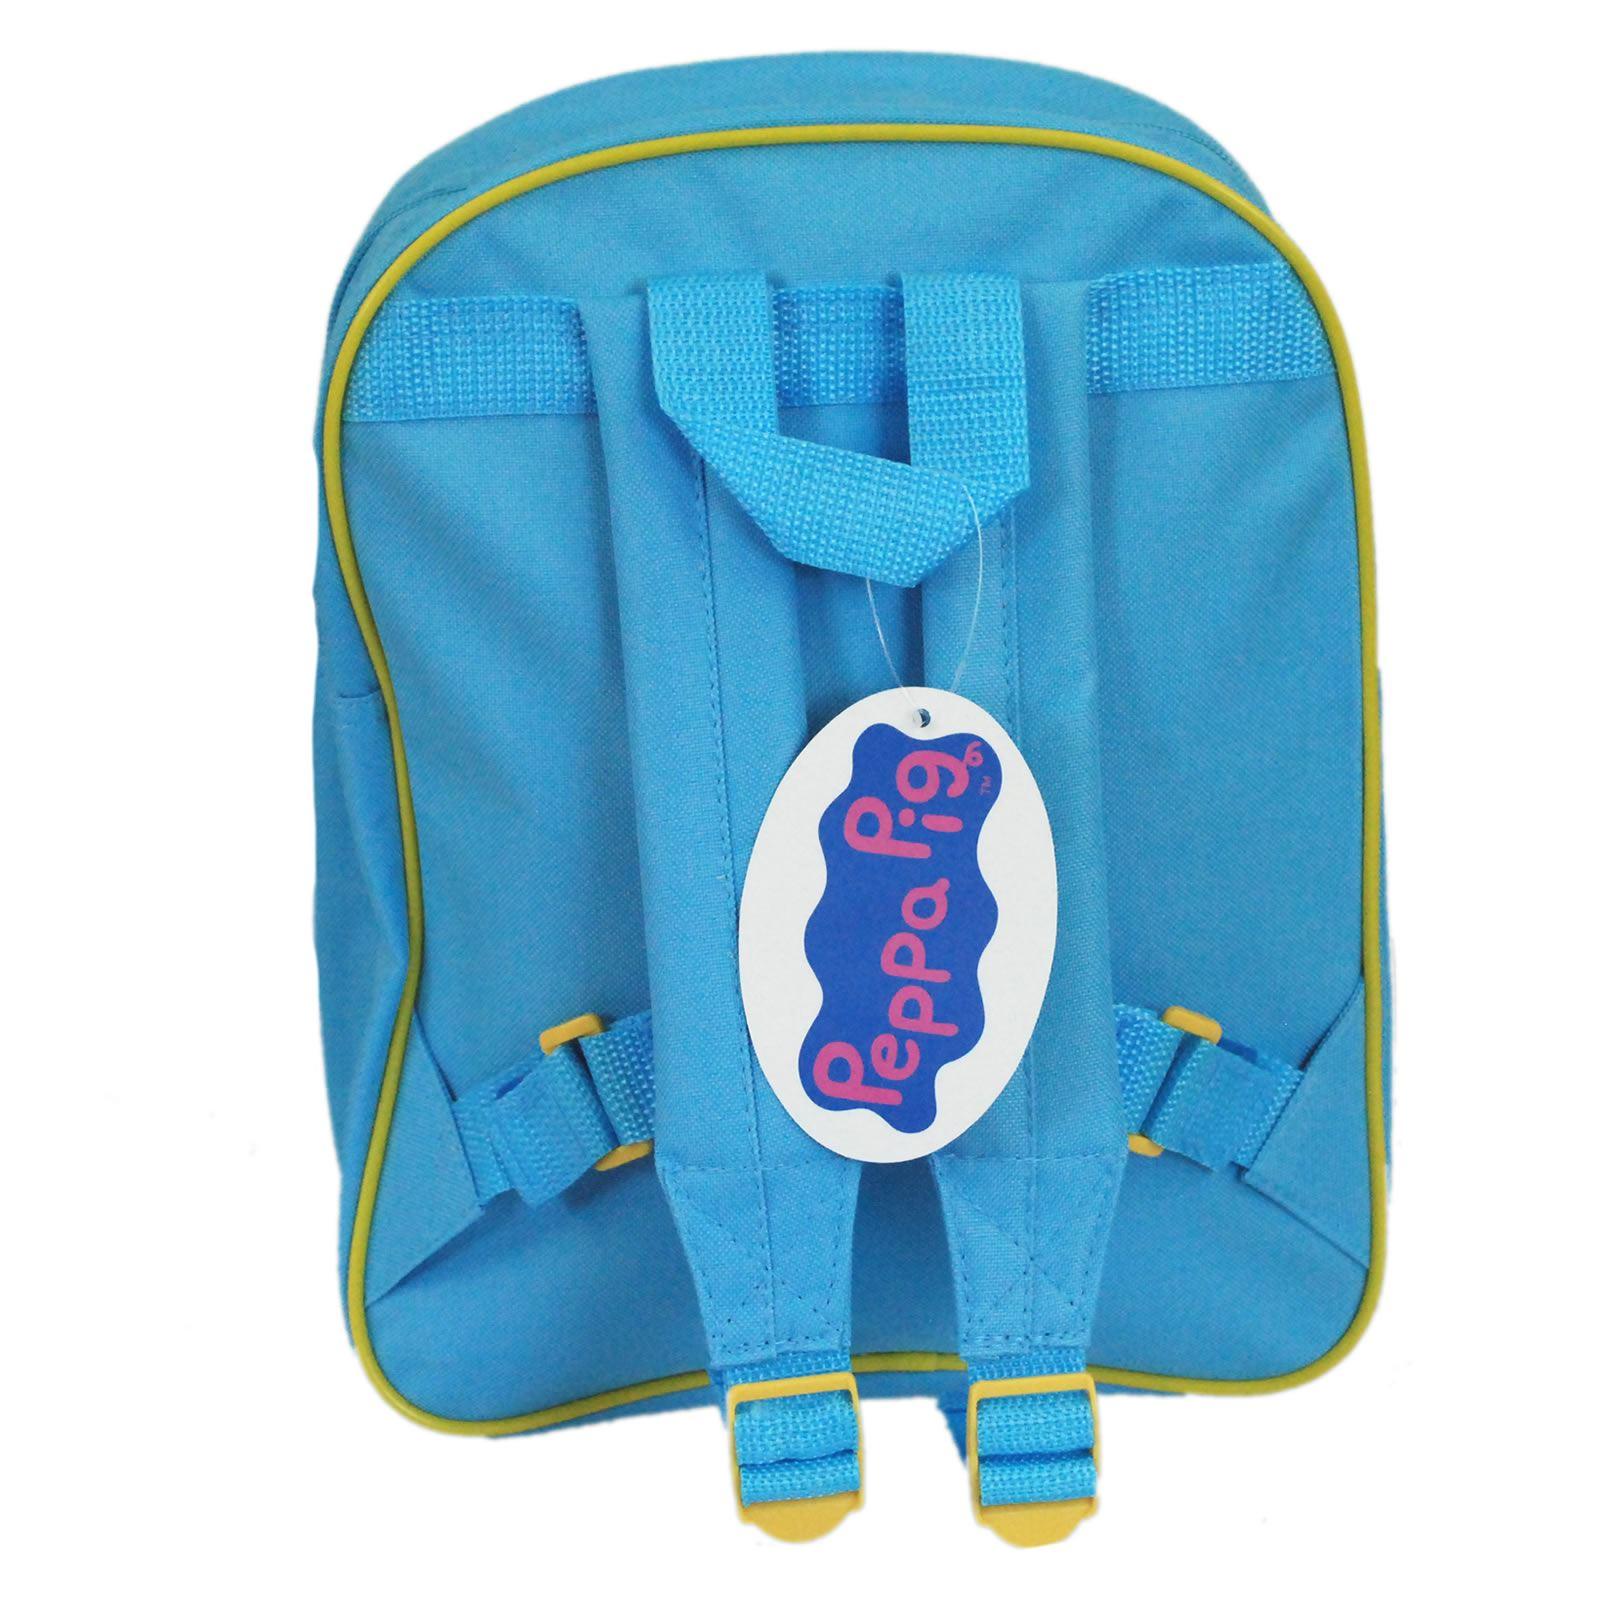 Peppa Pig Characters Girls Amp Boys Backpacks School Bags